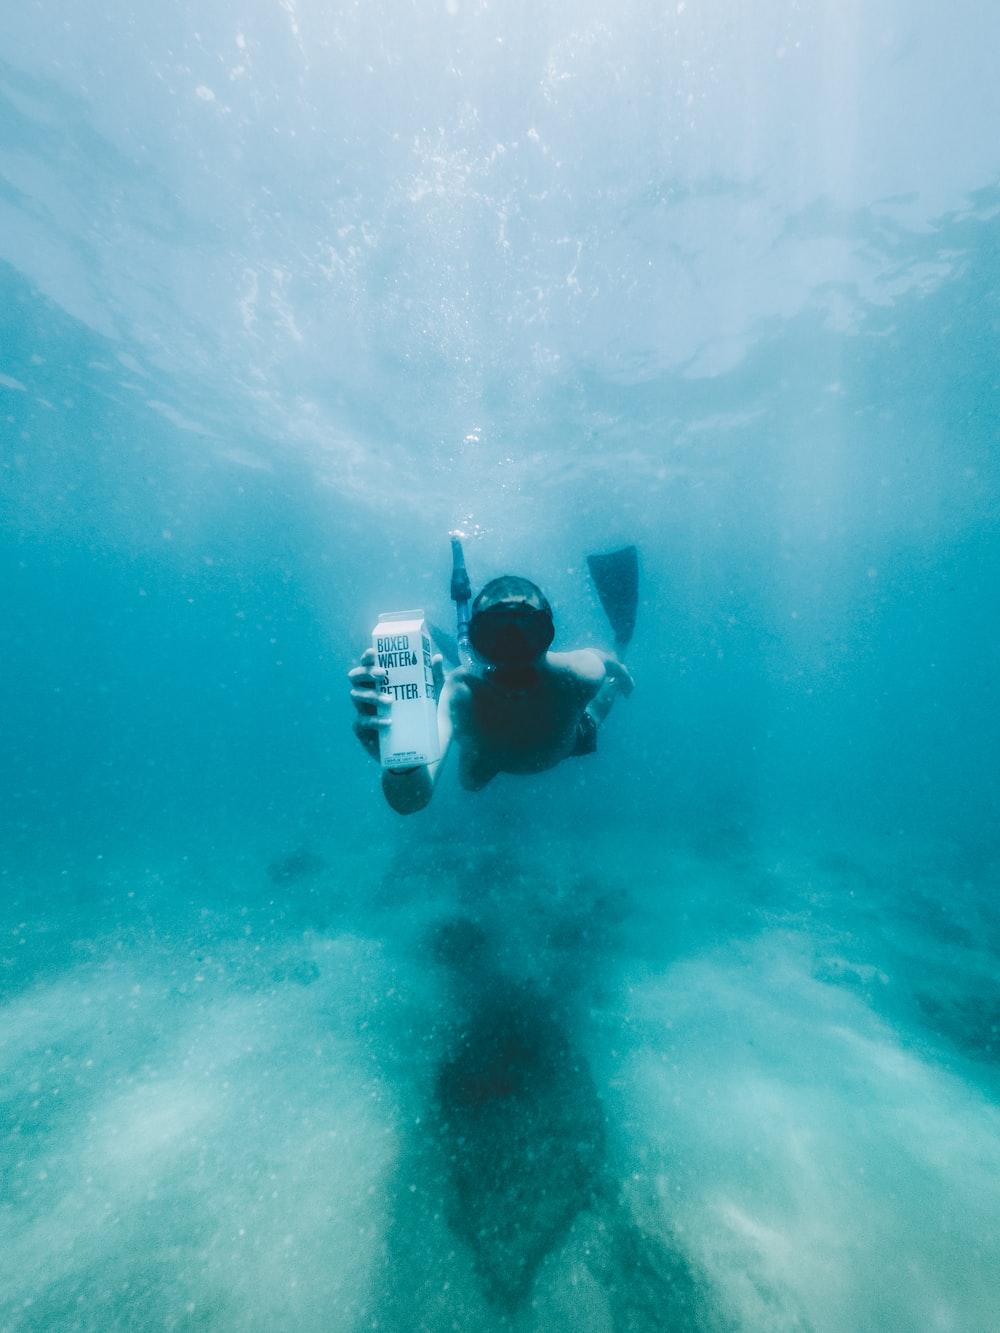 man in black diving suit under water